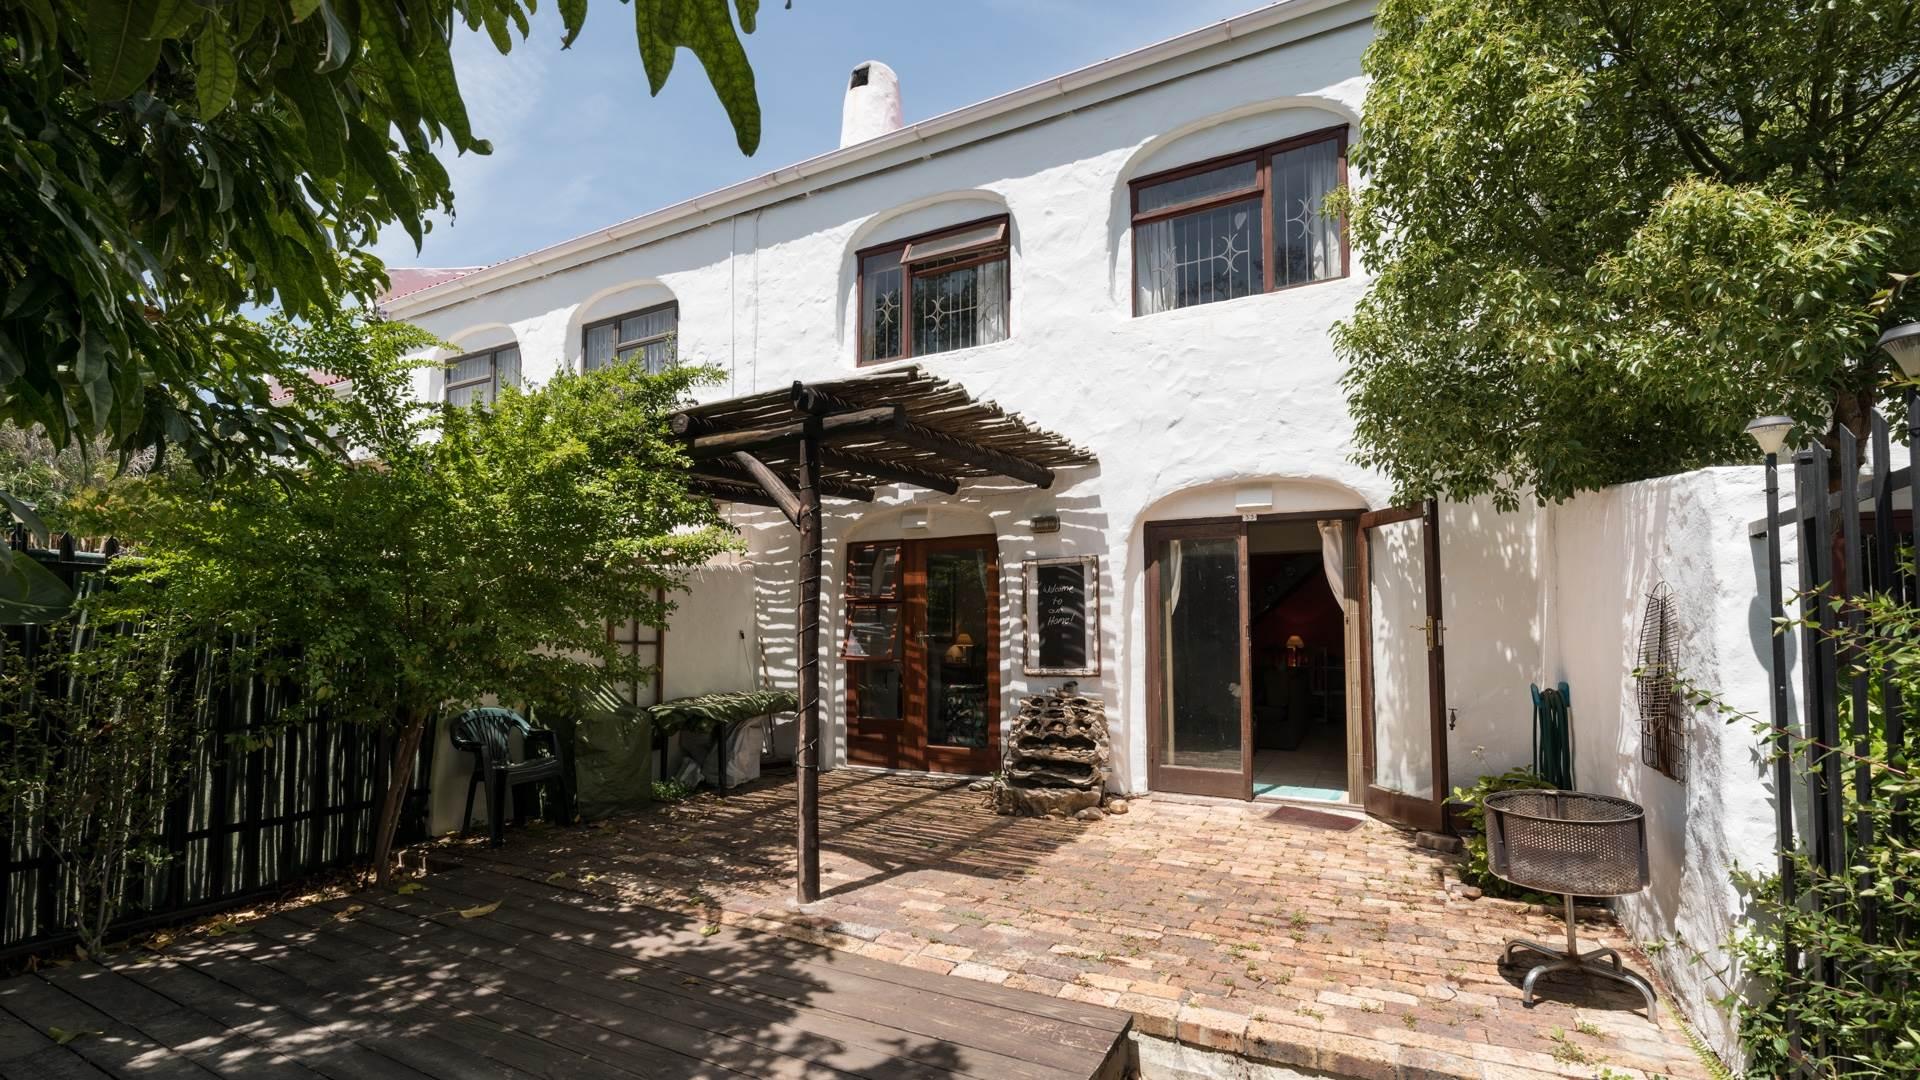 3 BedroomTownhouse For Sale In Longdown